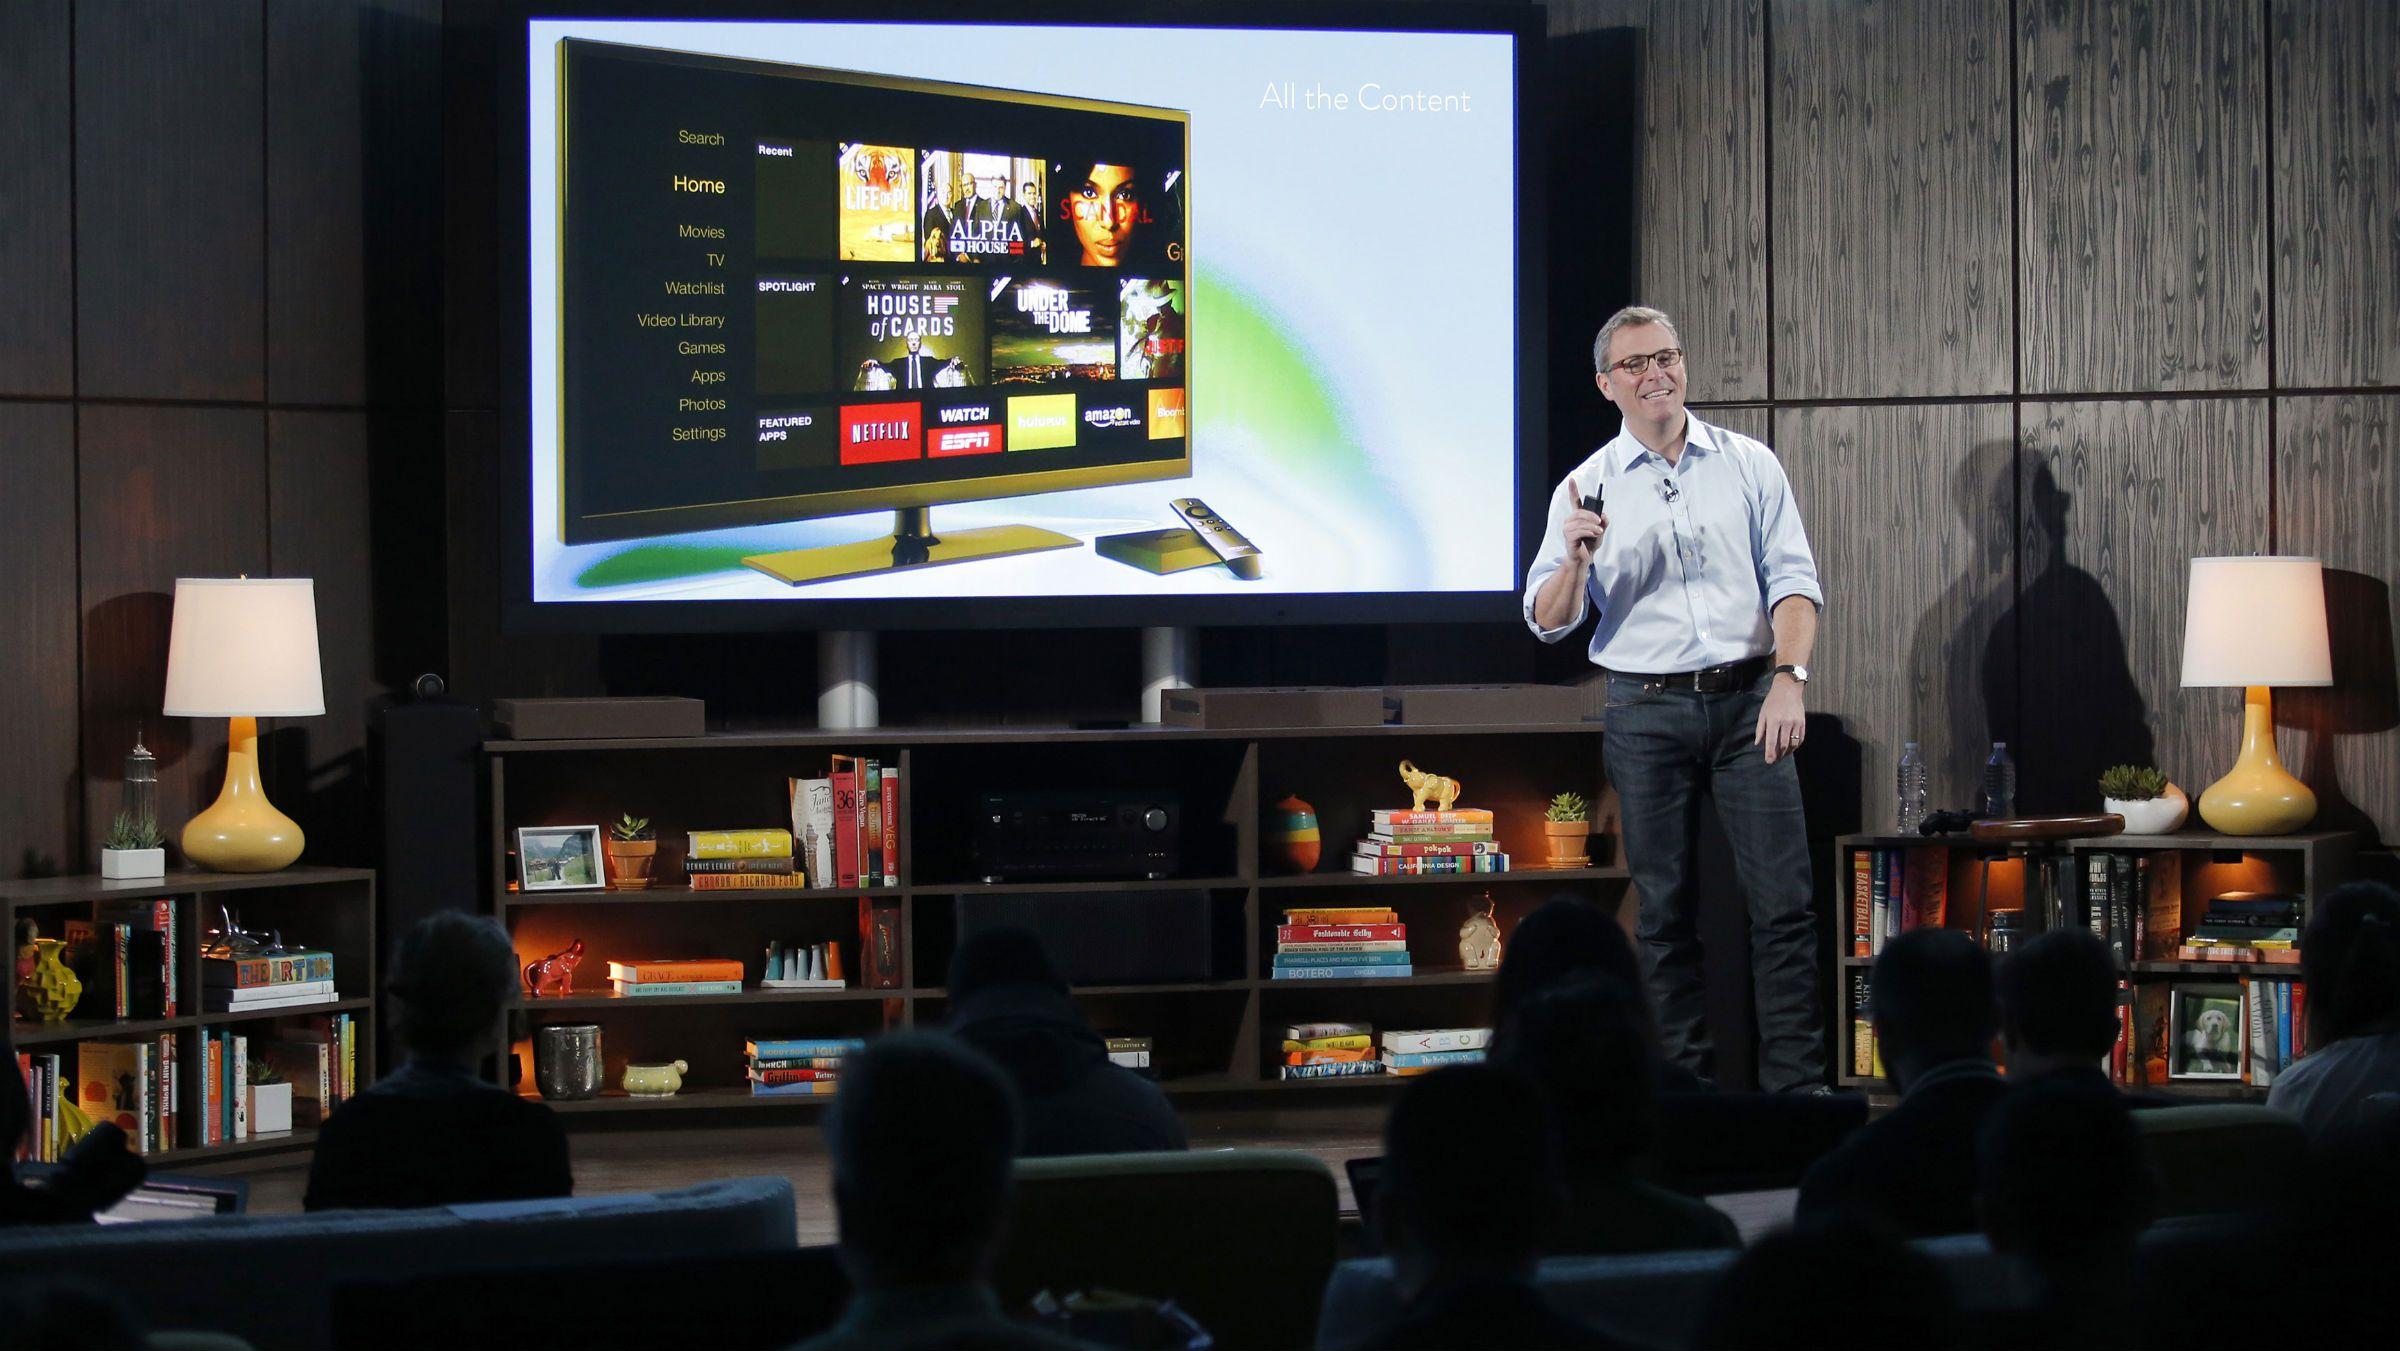 Amazon Fire TV event